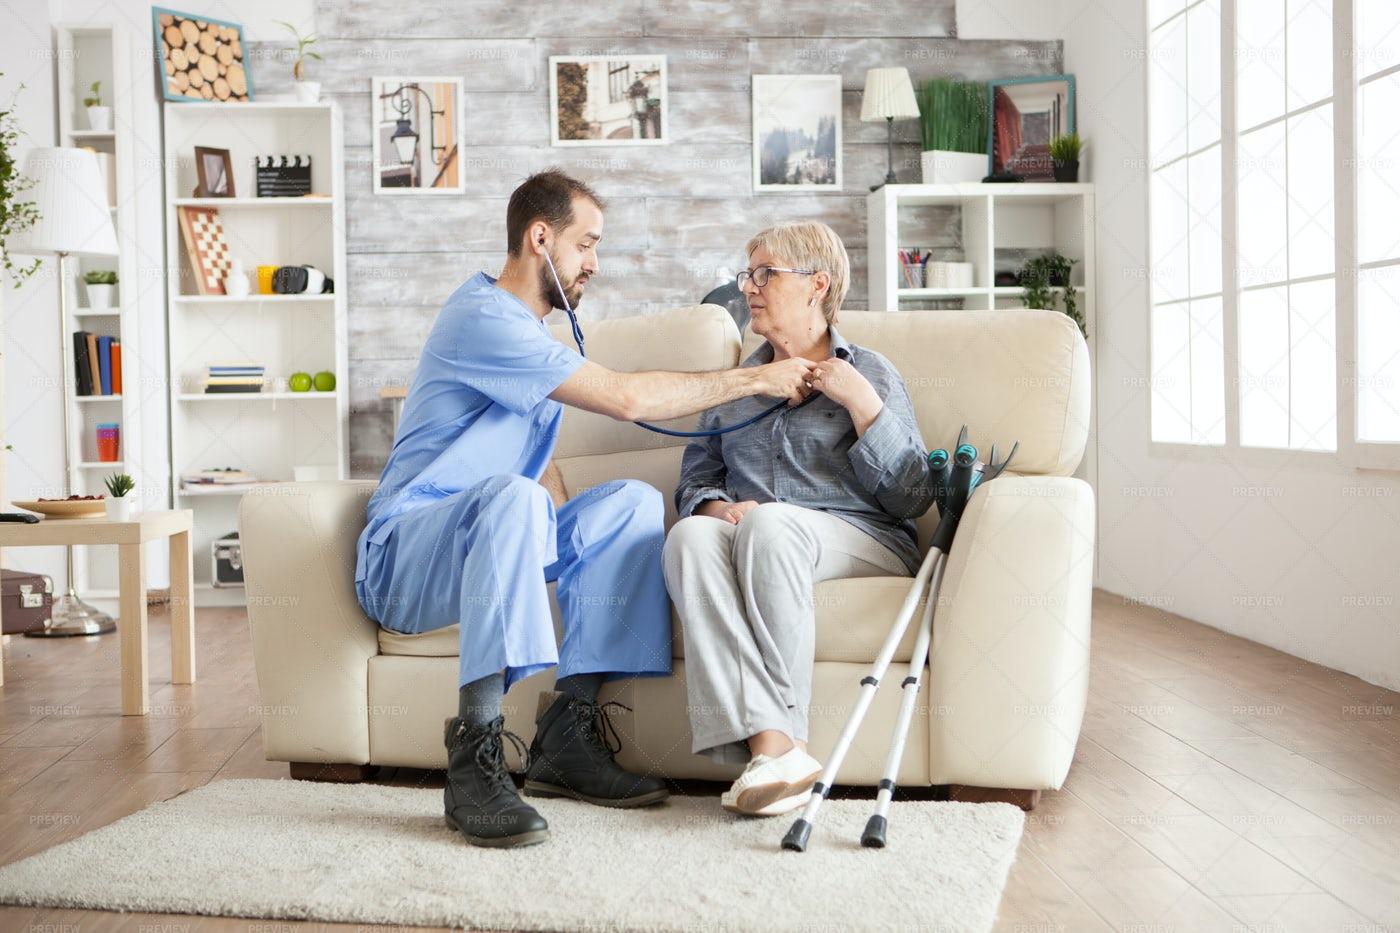 Nurse With Stethoscope Checks Woman: Stock Photos